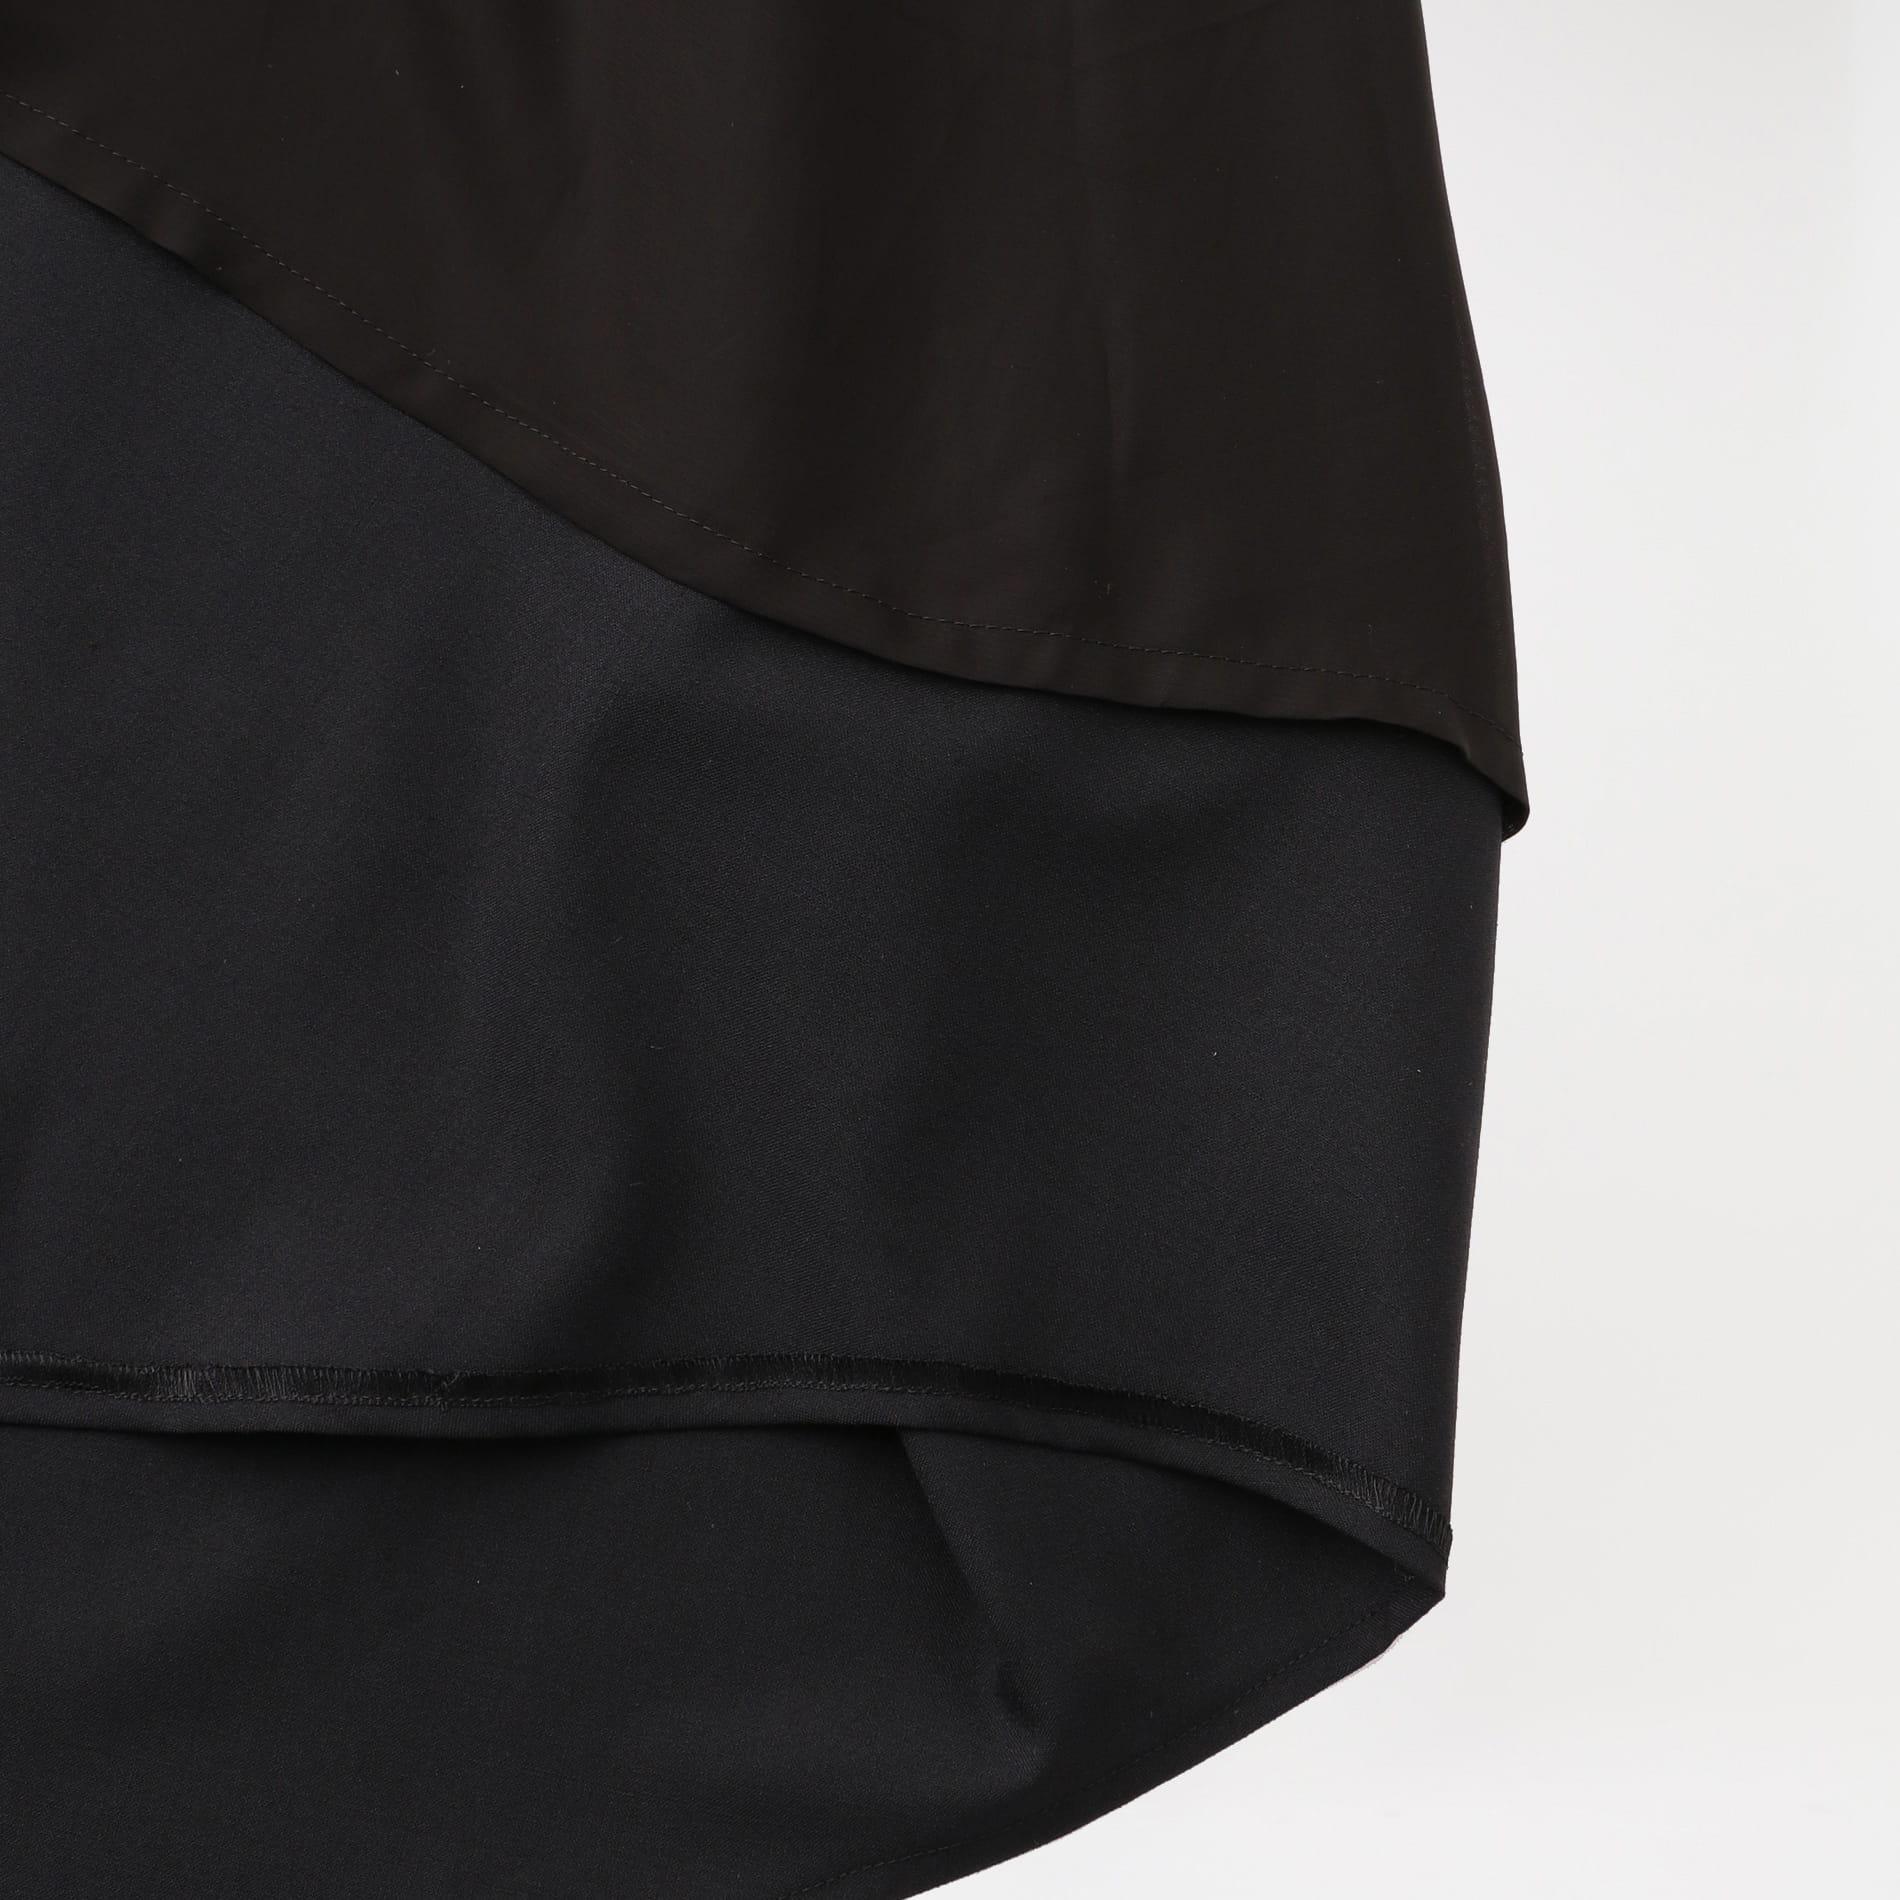 【YOHEI OHNO】WOMEN Side Paded Dress OH-20O-DR6